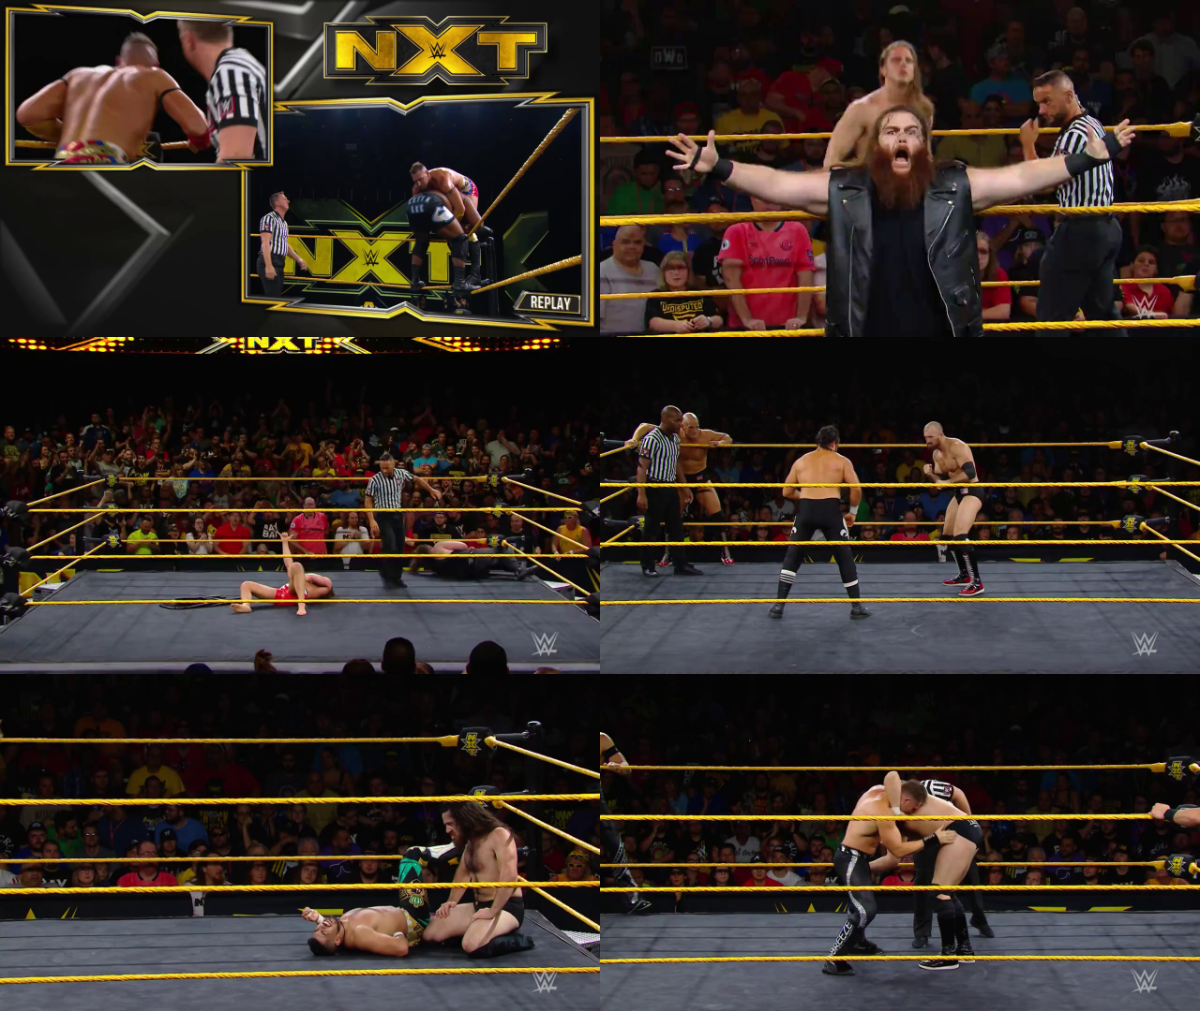 WWE NXT 2019 09 25 WWEN 720p Lo WEB h264-HEEL